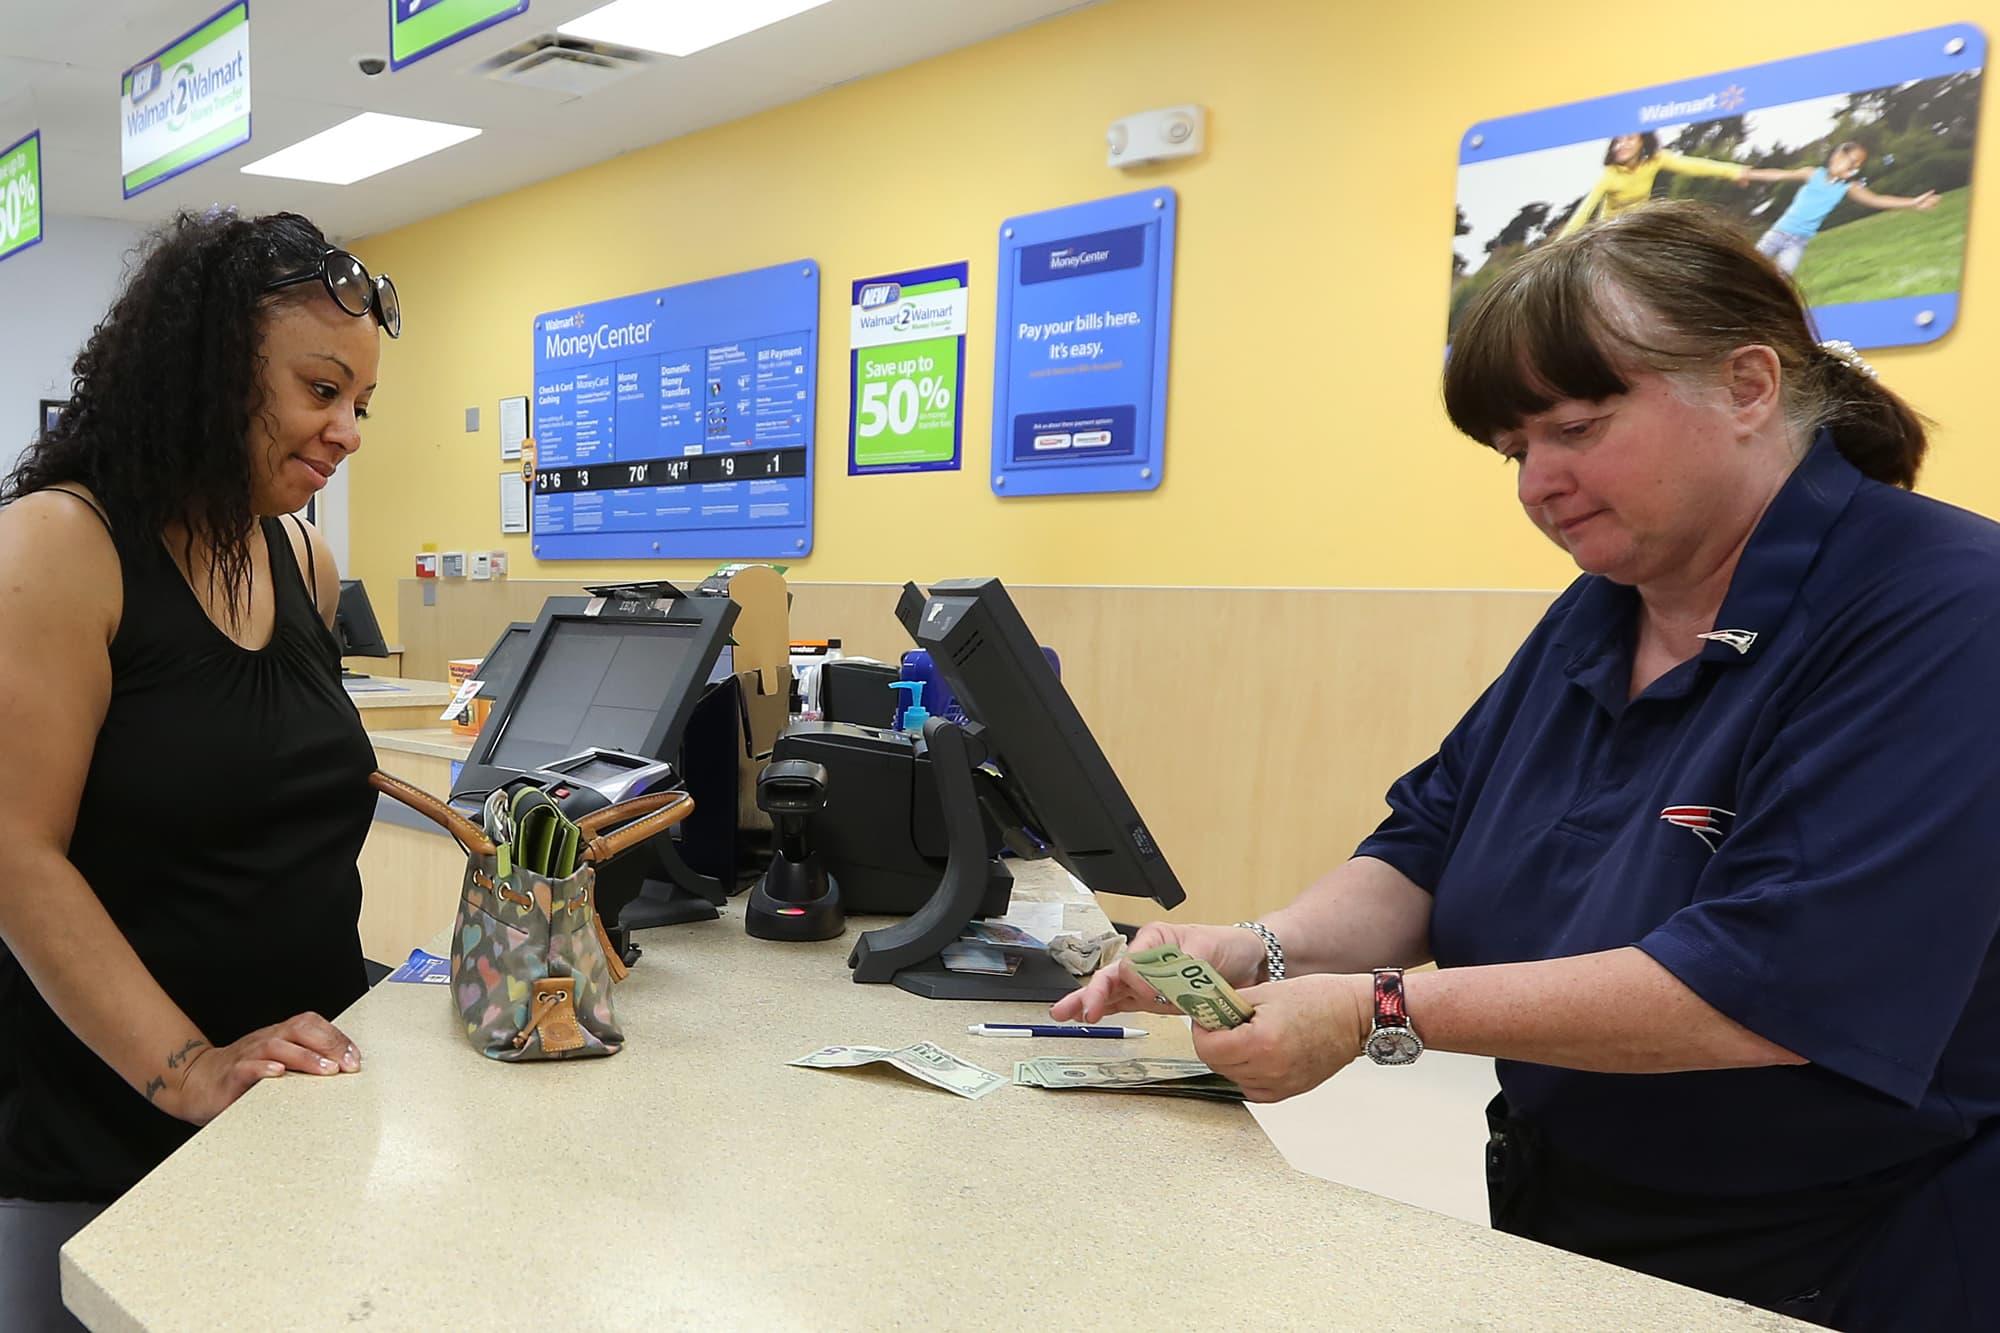 Walmart takes money transfer service global with Walmart2World on